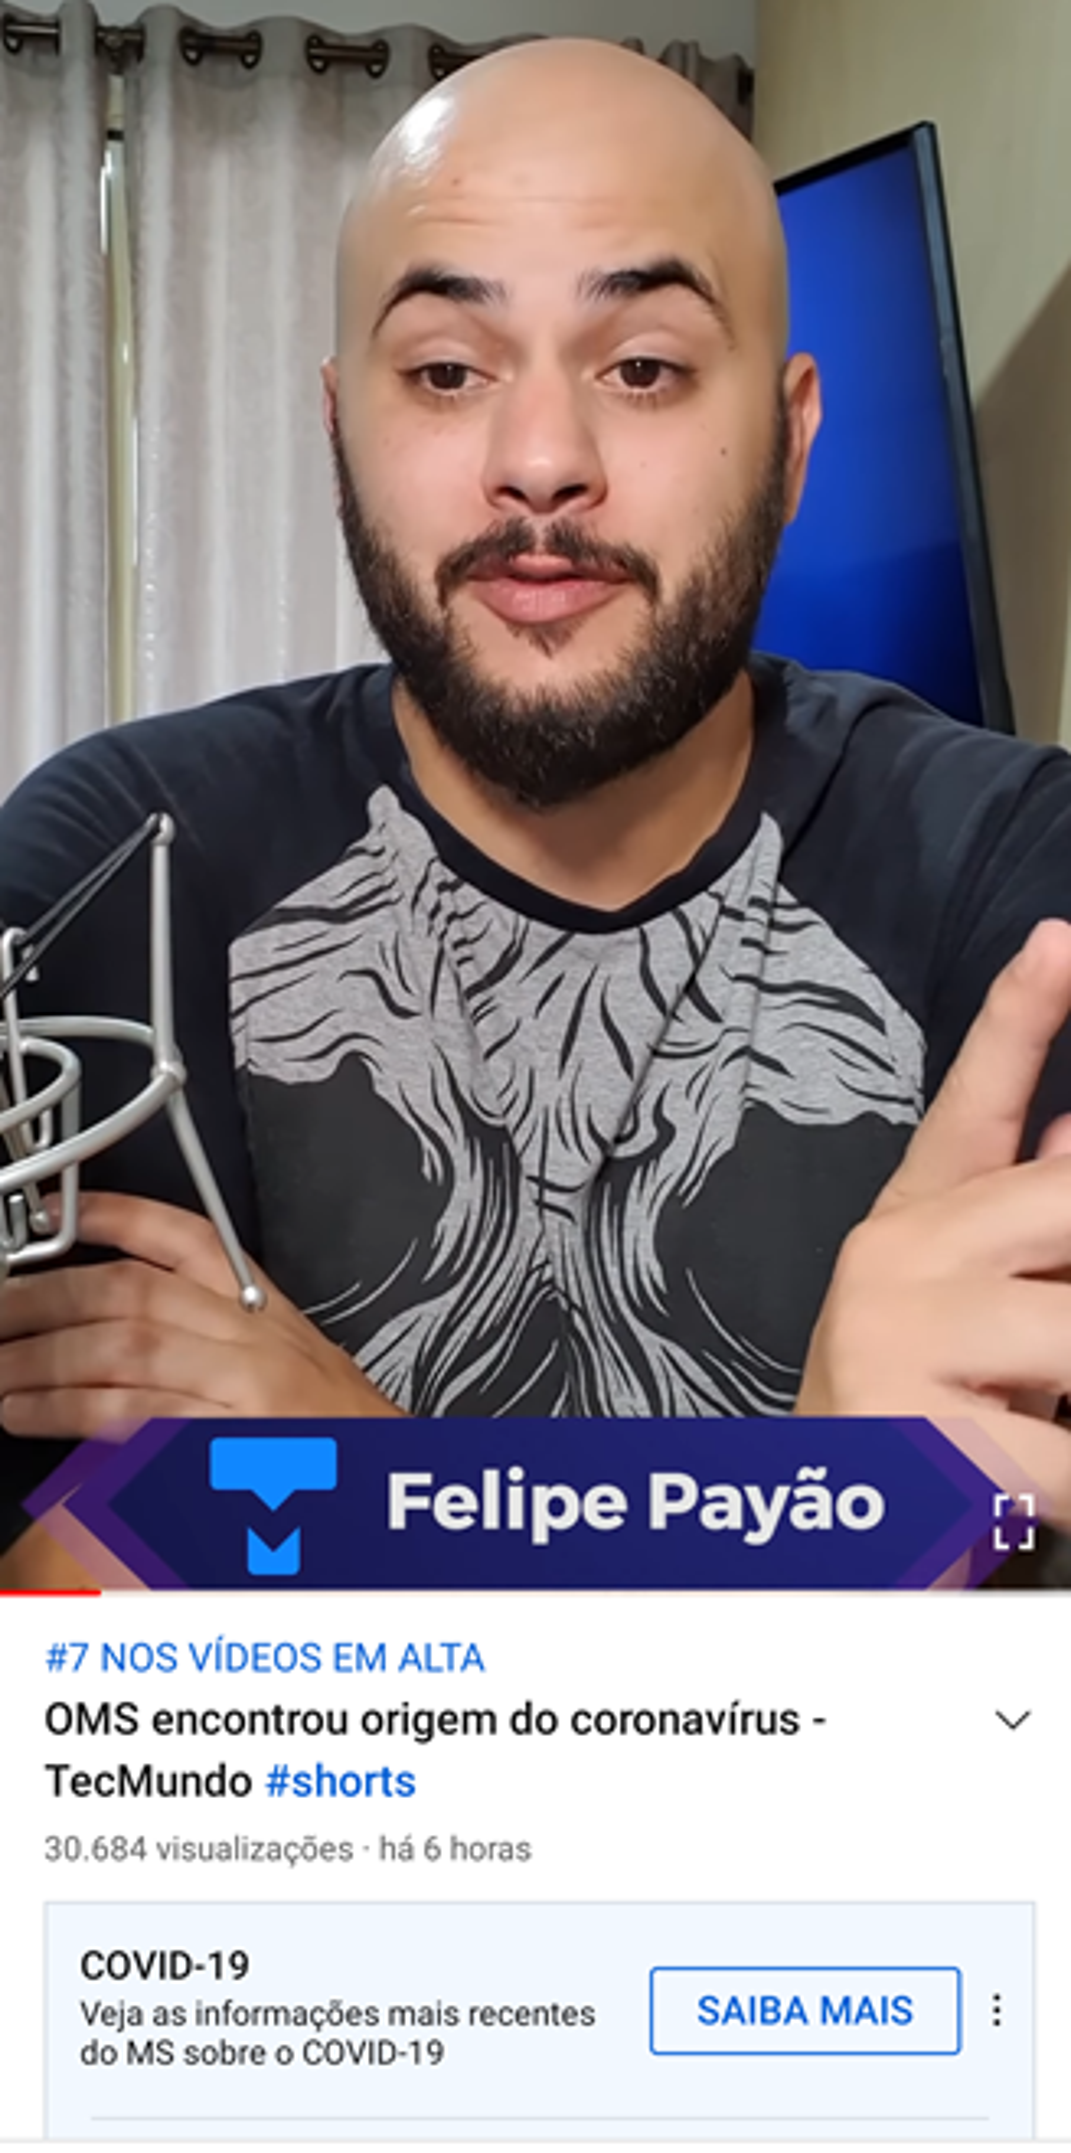 YouTube Shorts TecMundo